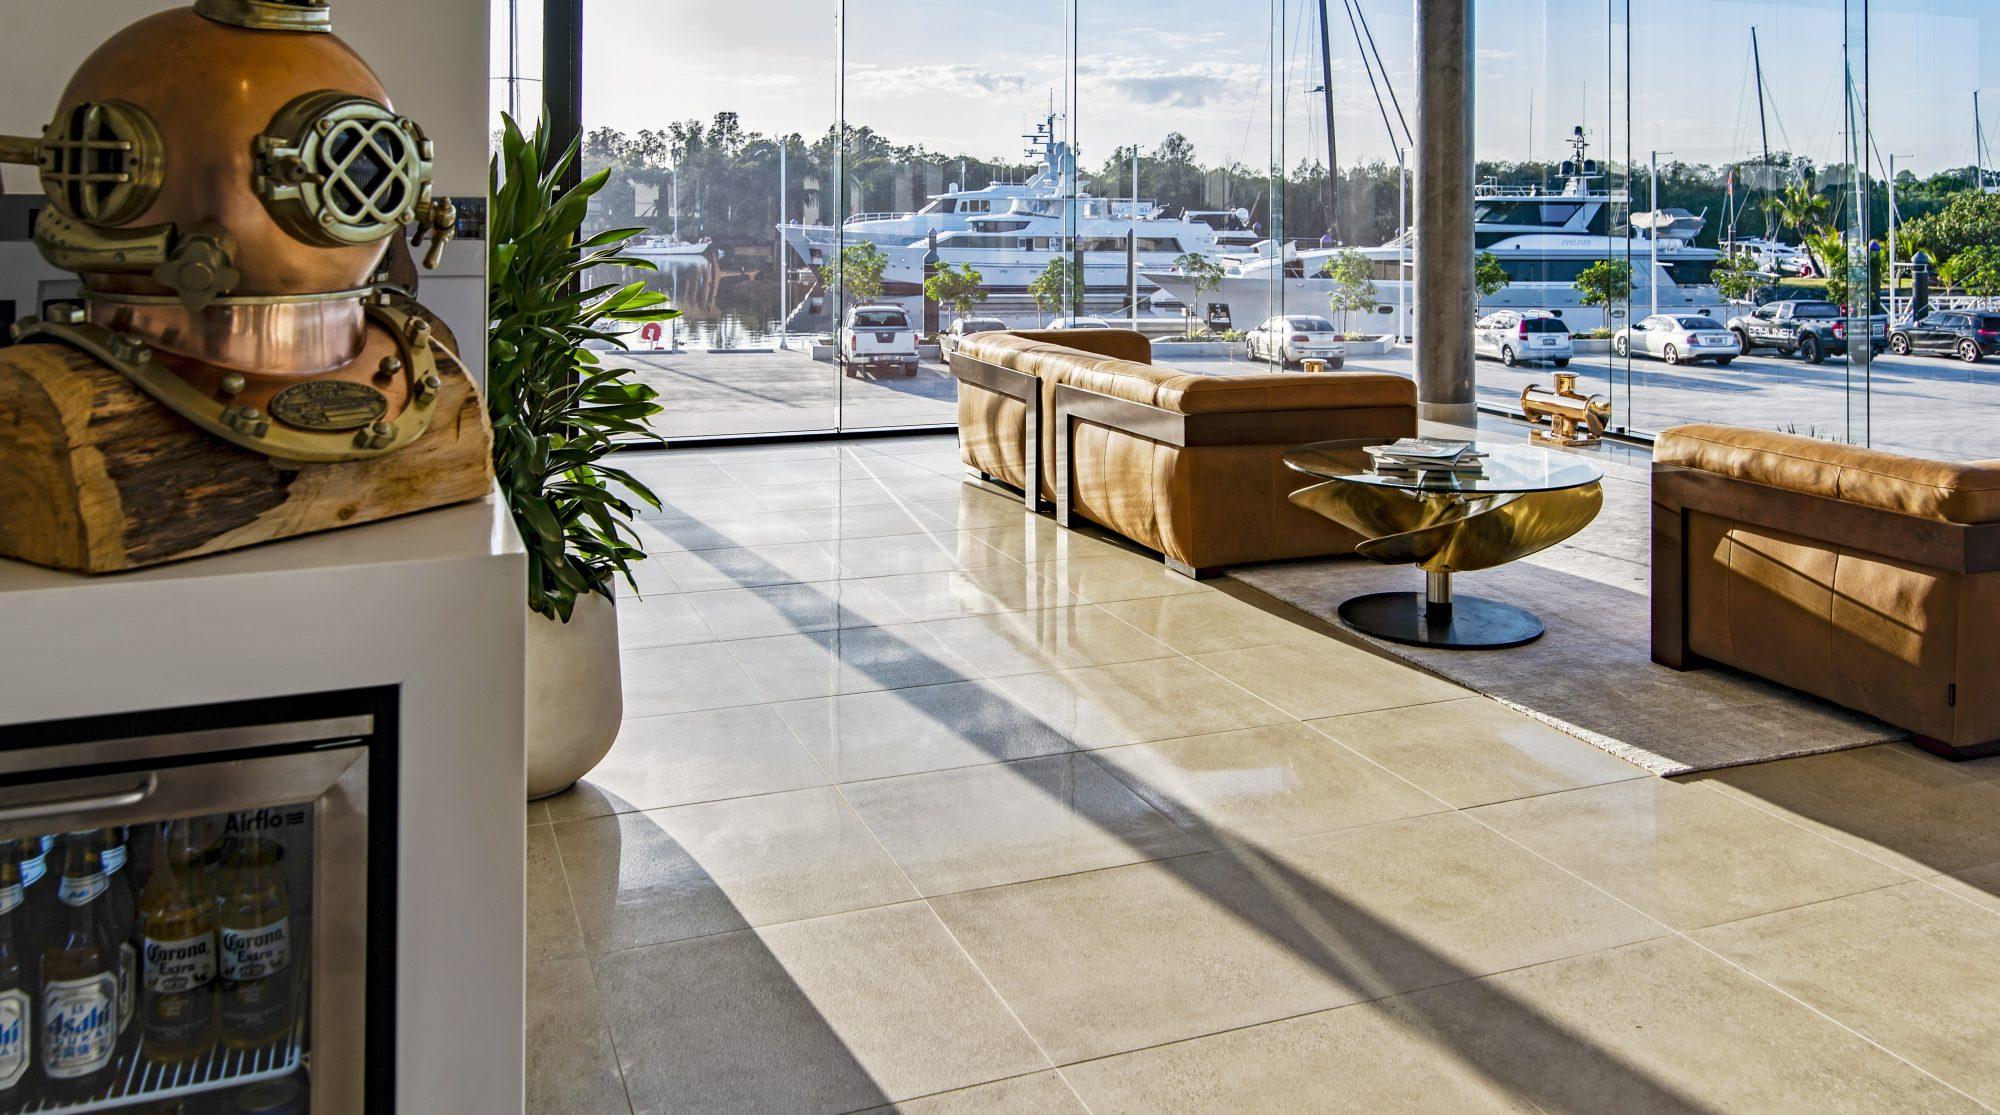 The Boat Work VIP Lounge 3